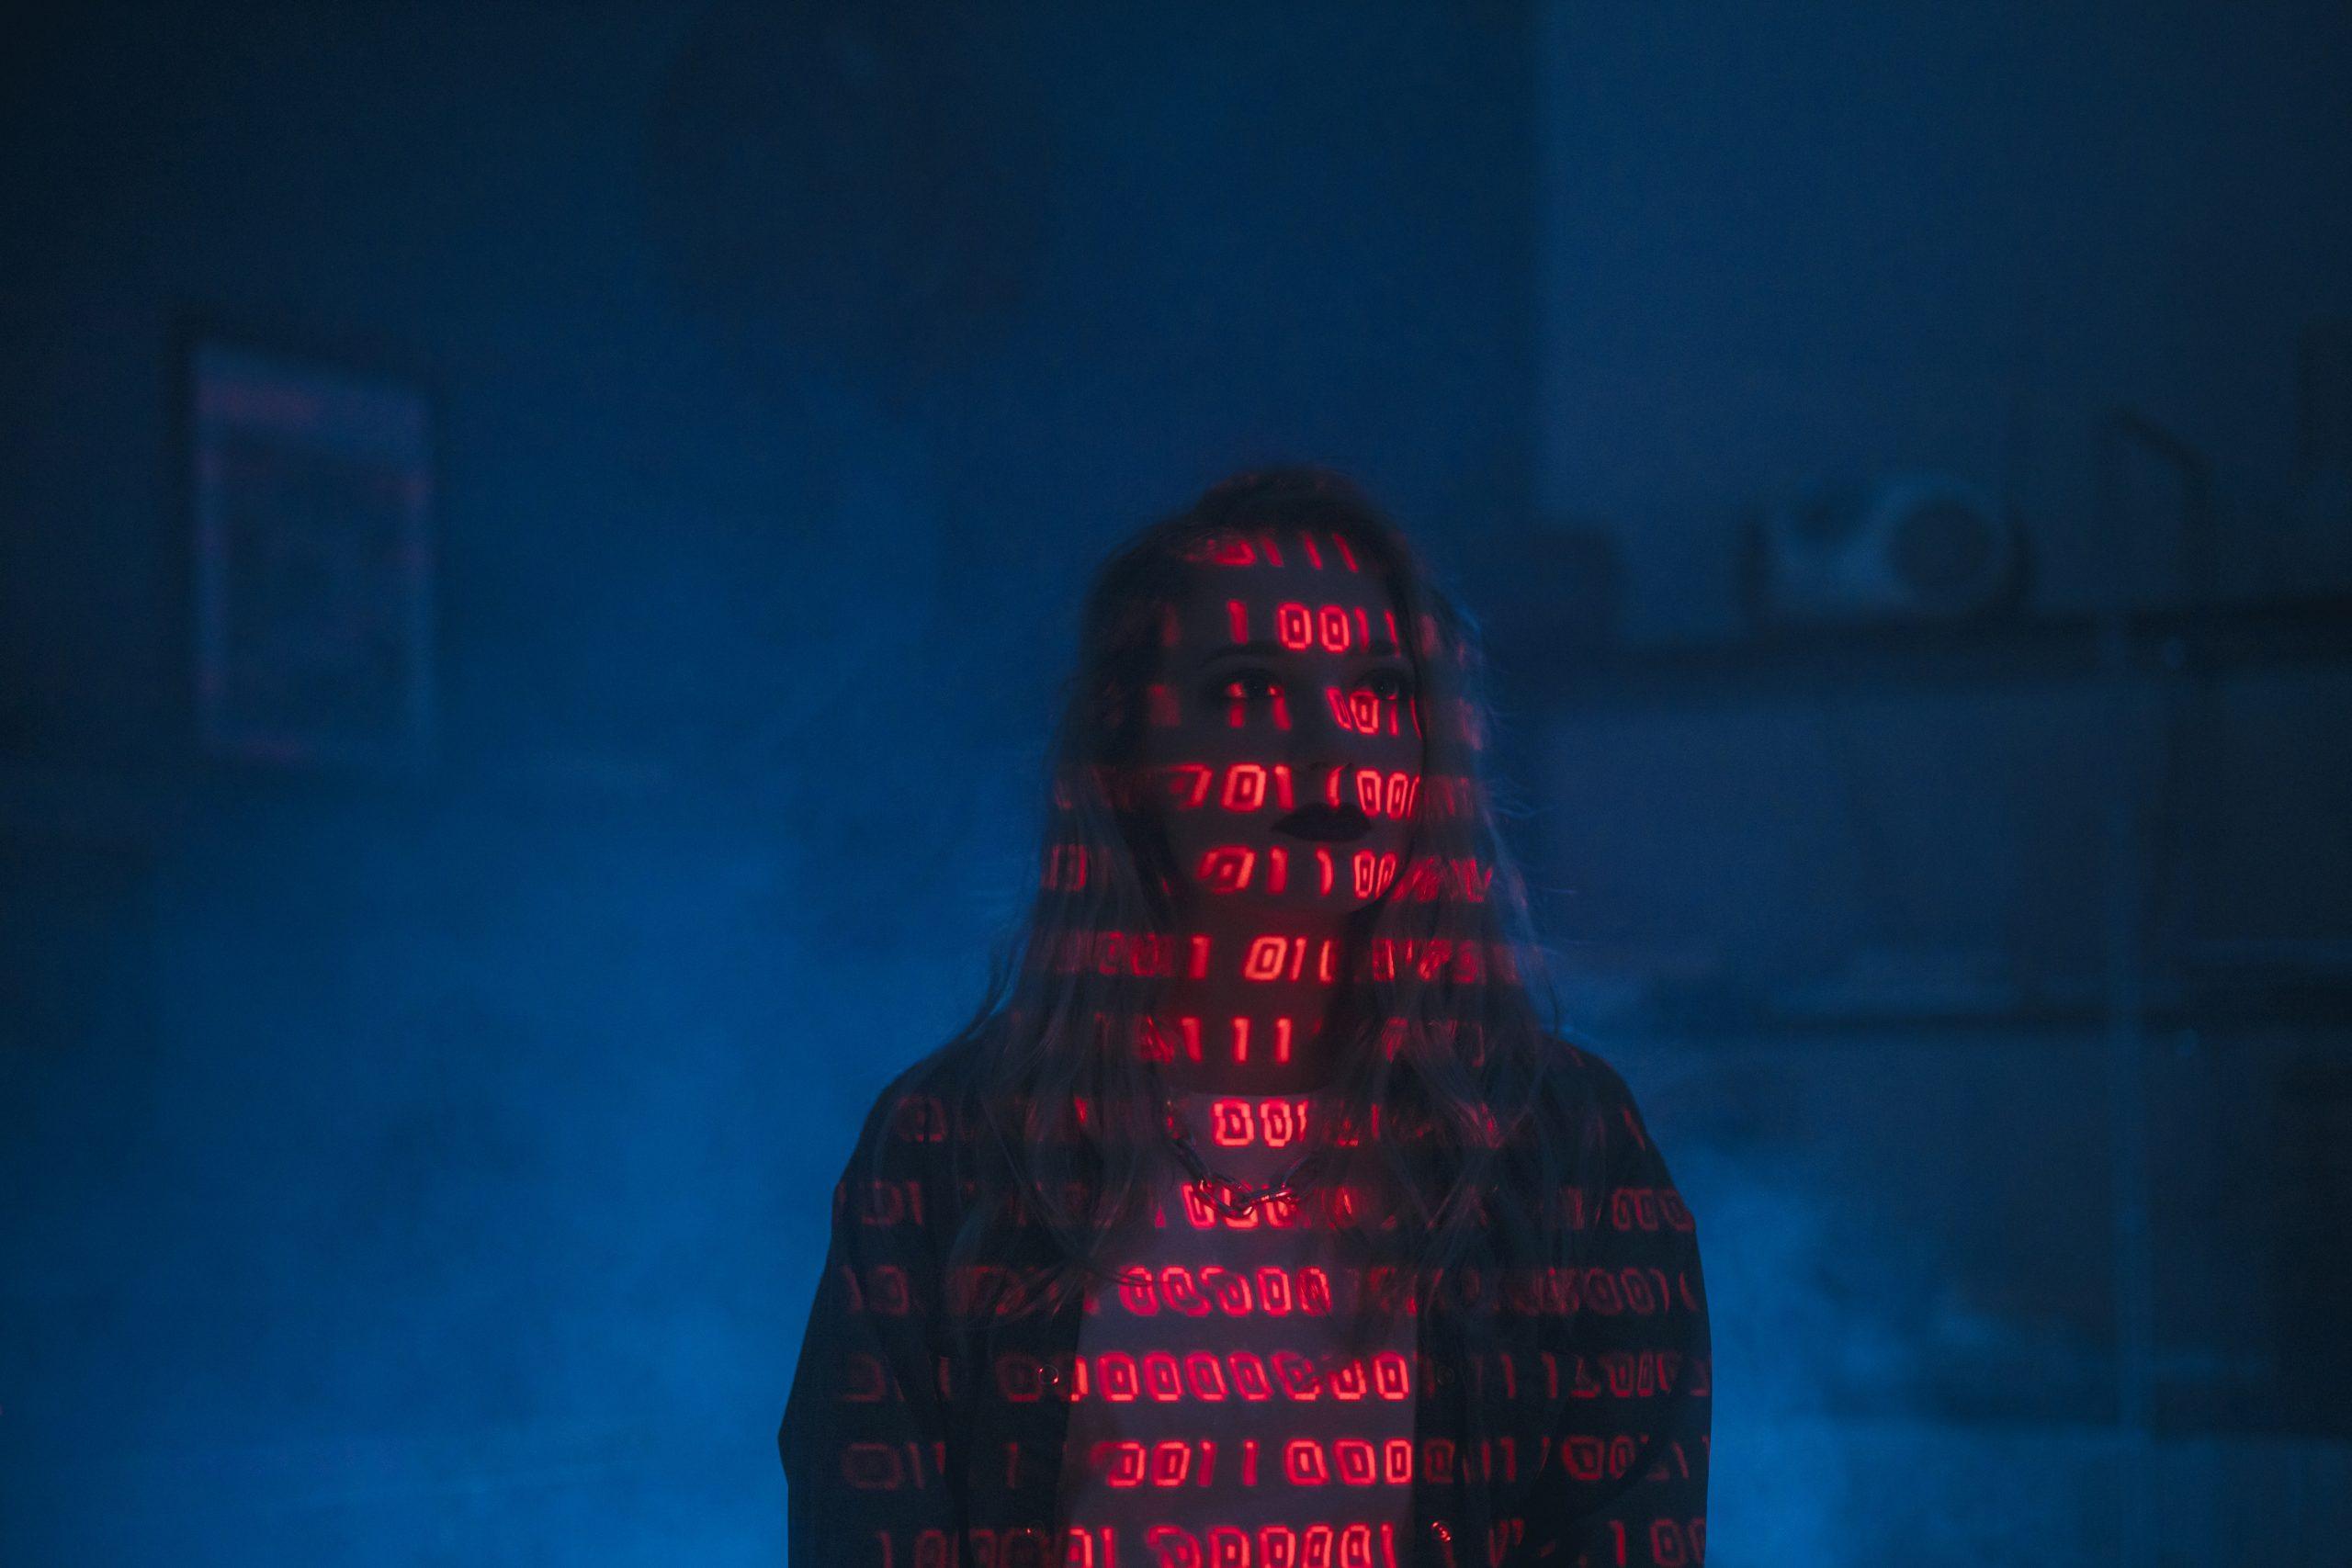 Ryuk, Emotet, TrickBot: Defending Against Malware with EPM